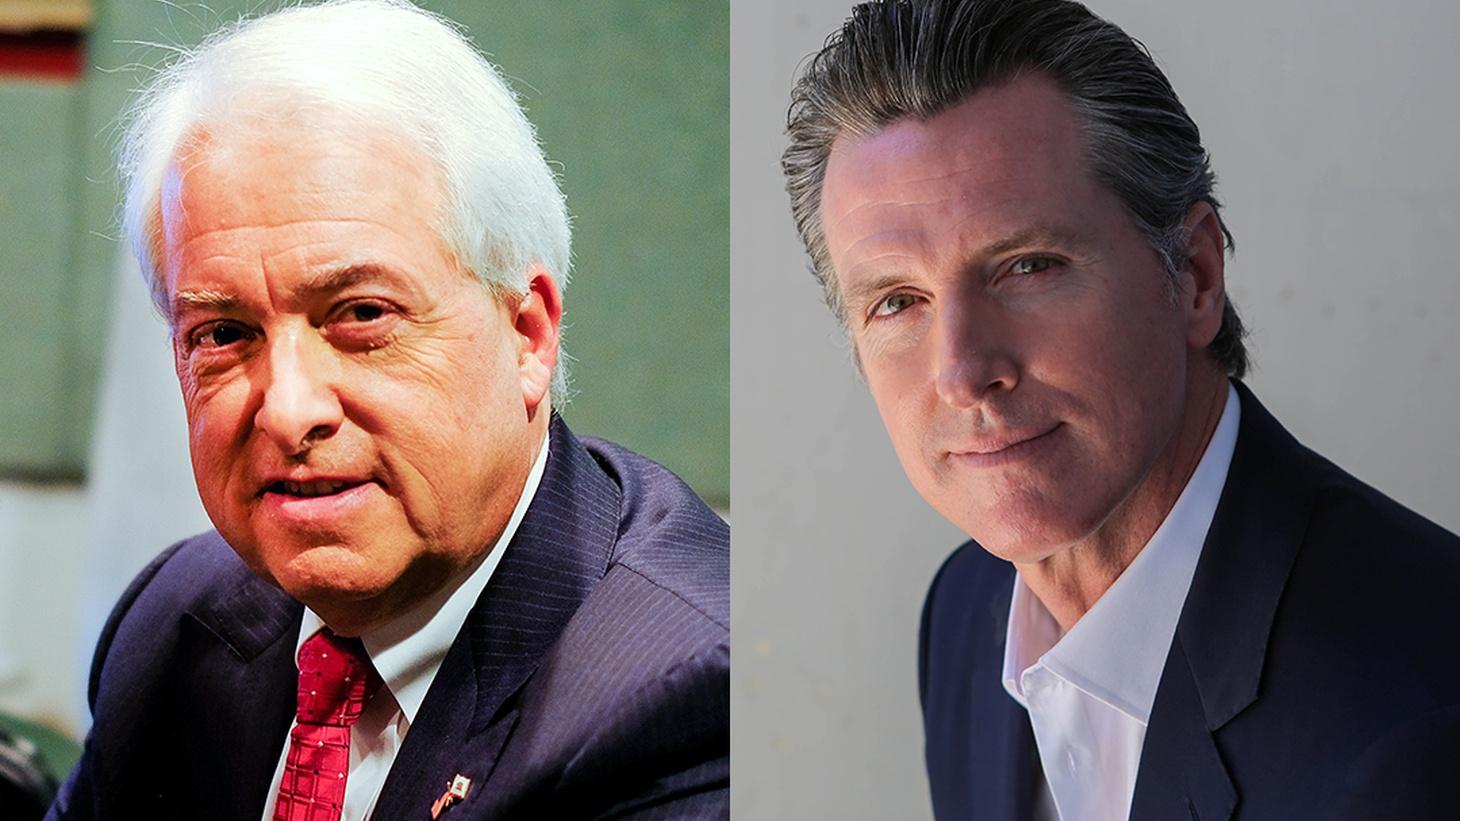 A debate between Gavin Newsom and John Cox hosted by KQED.